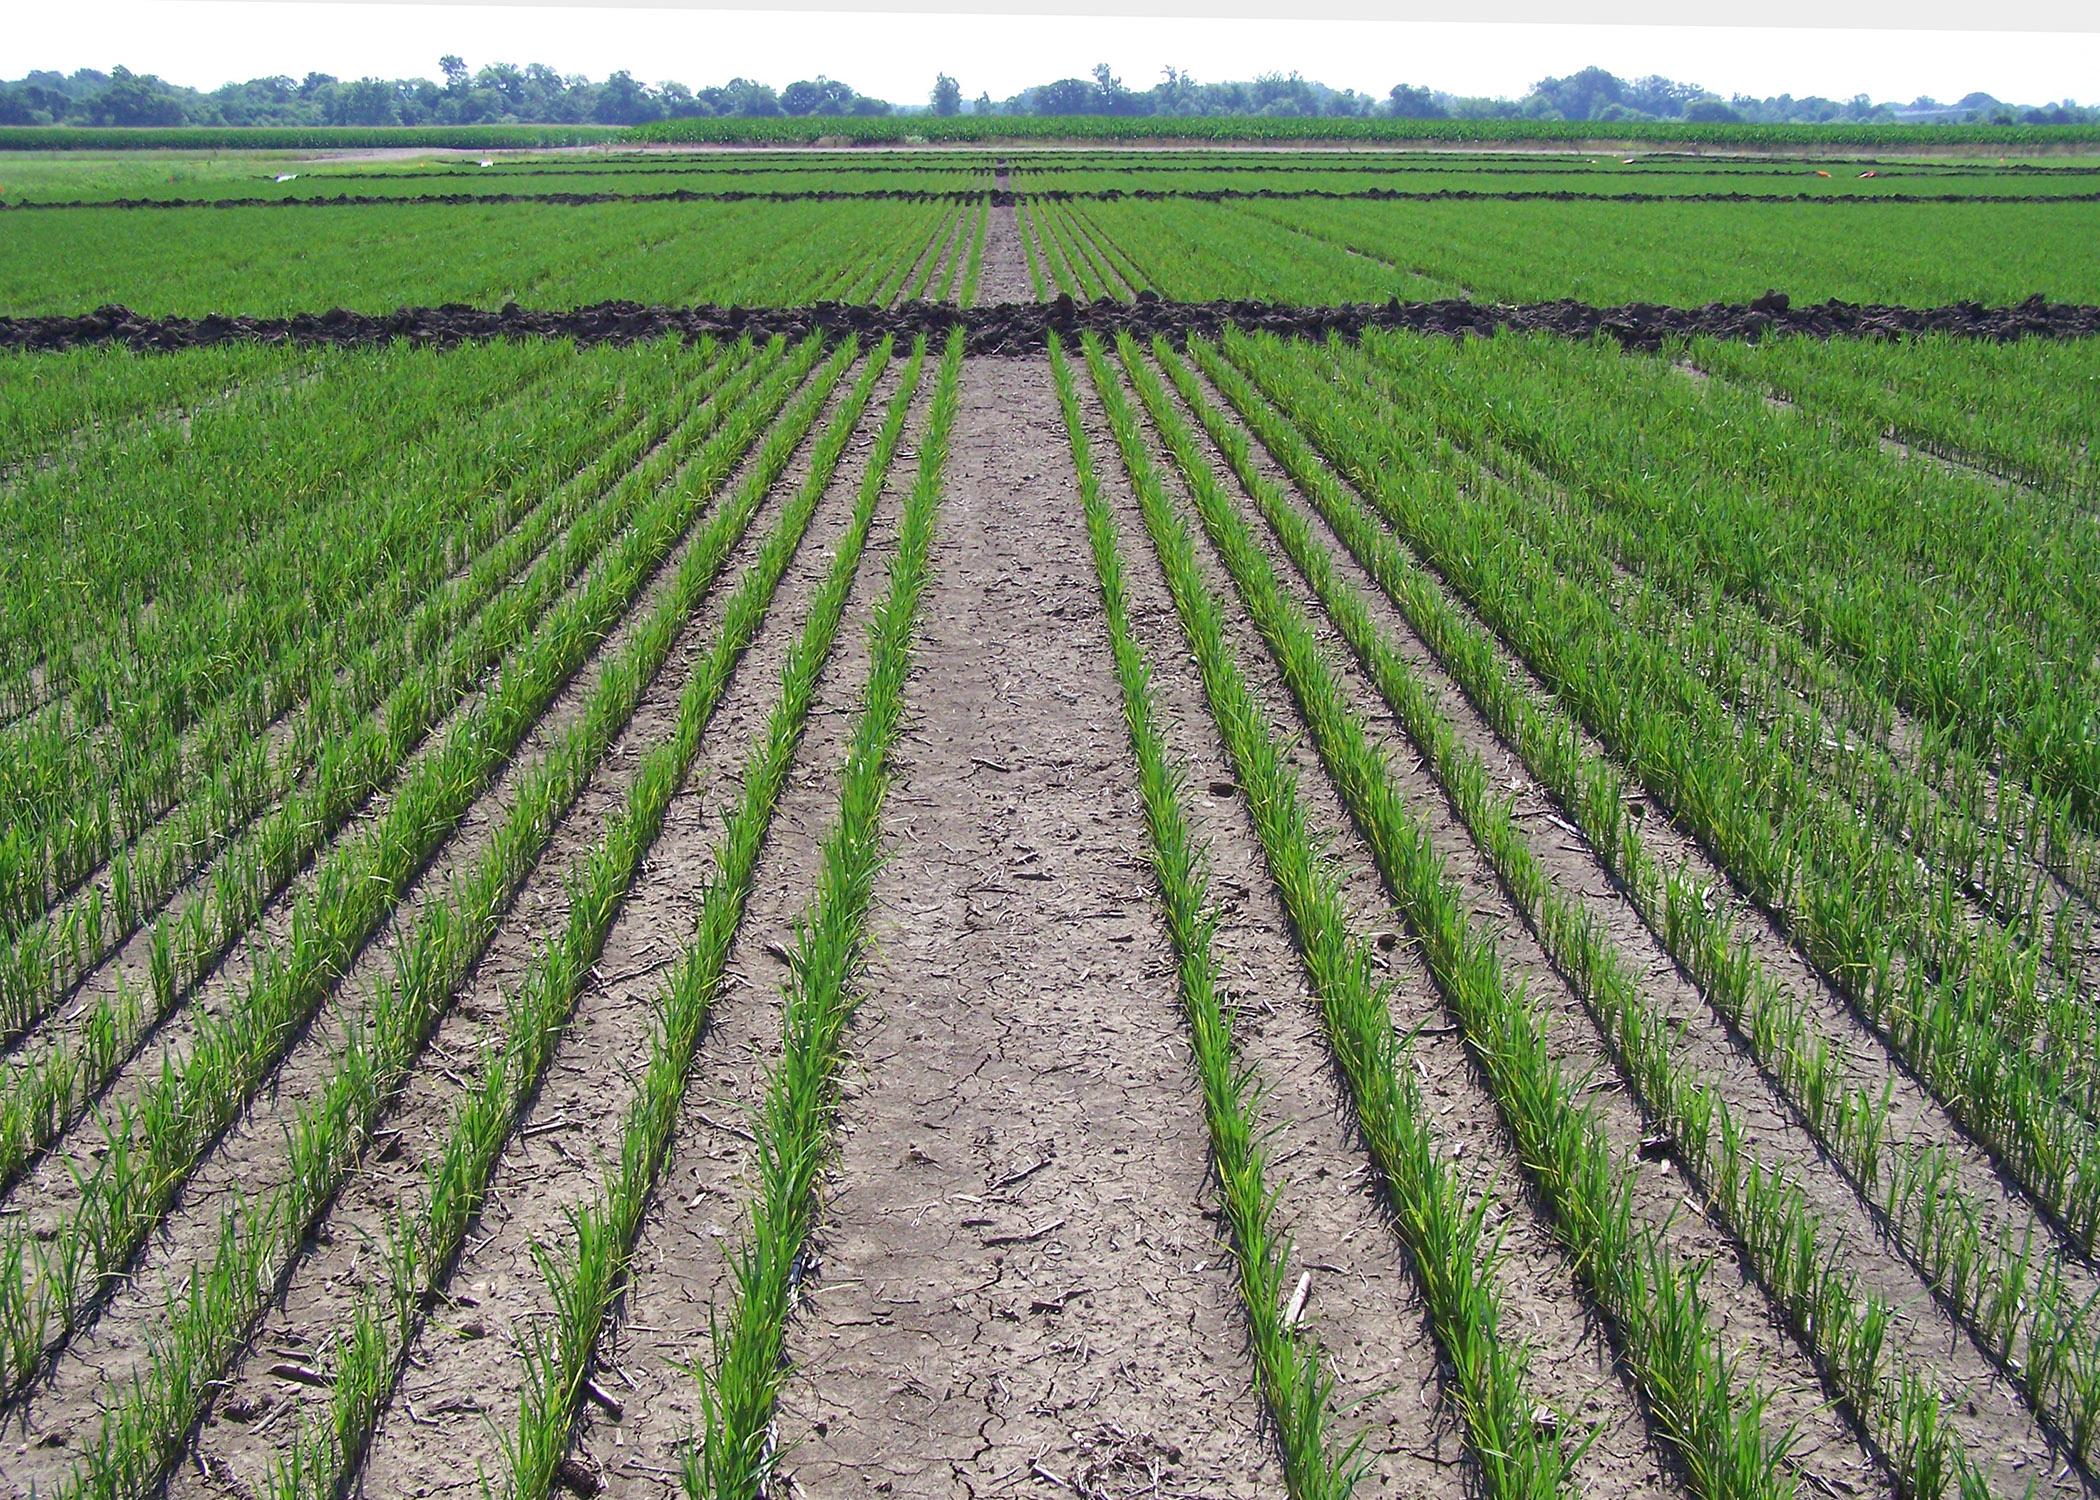 Rains challenge even Mississippi rice fields | Mississippi State ...